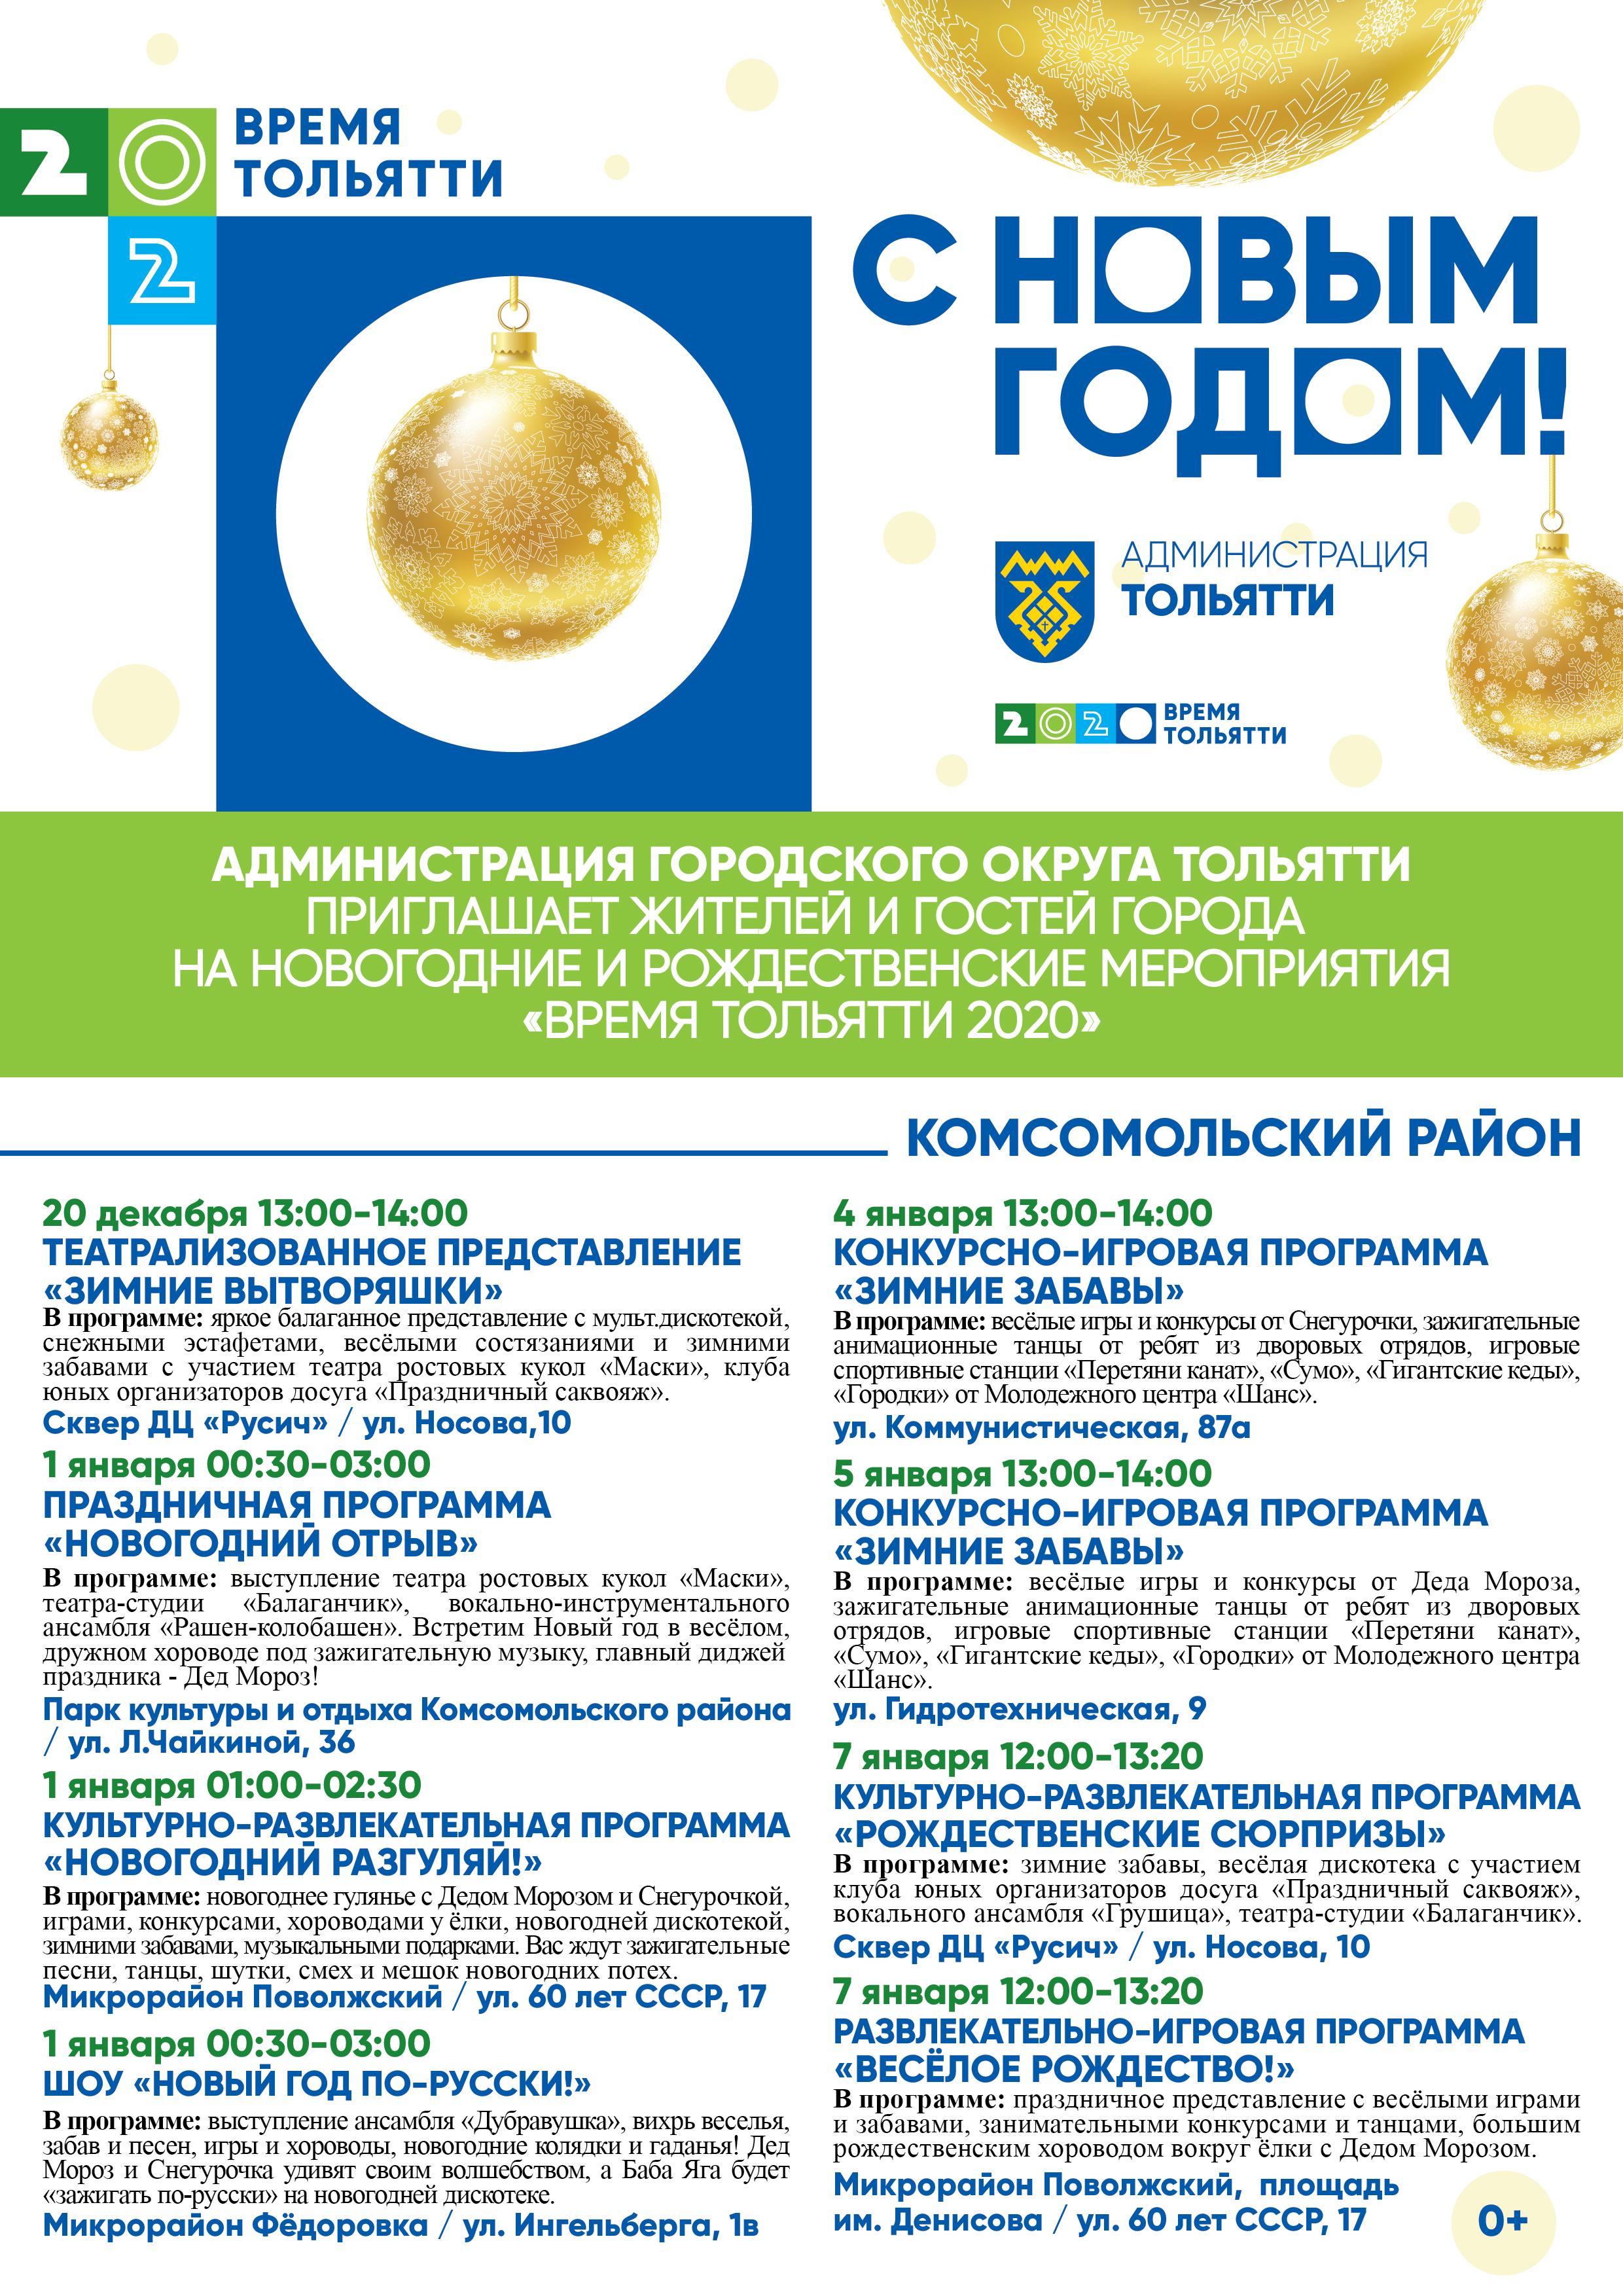 afisha-ng-2020-komsomolskiy-rayon_file_1576149196